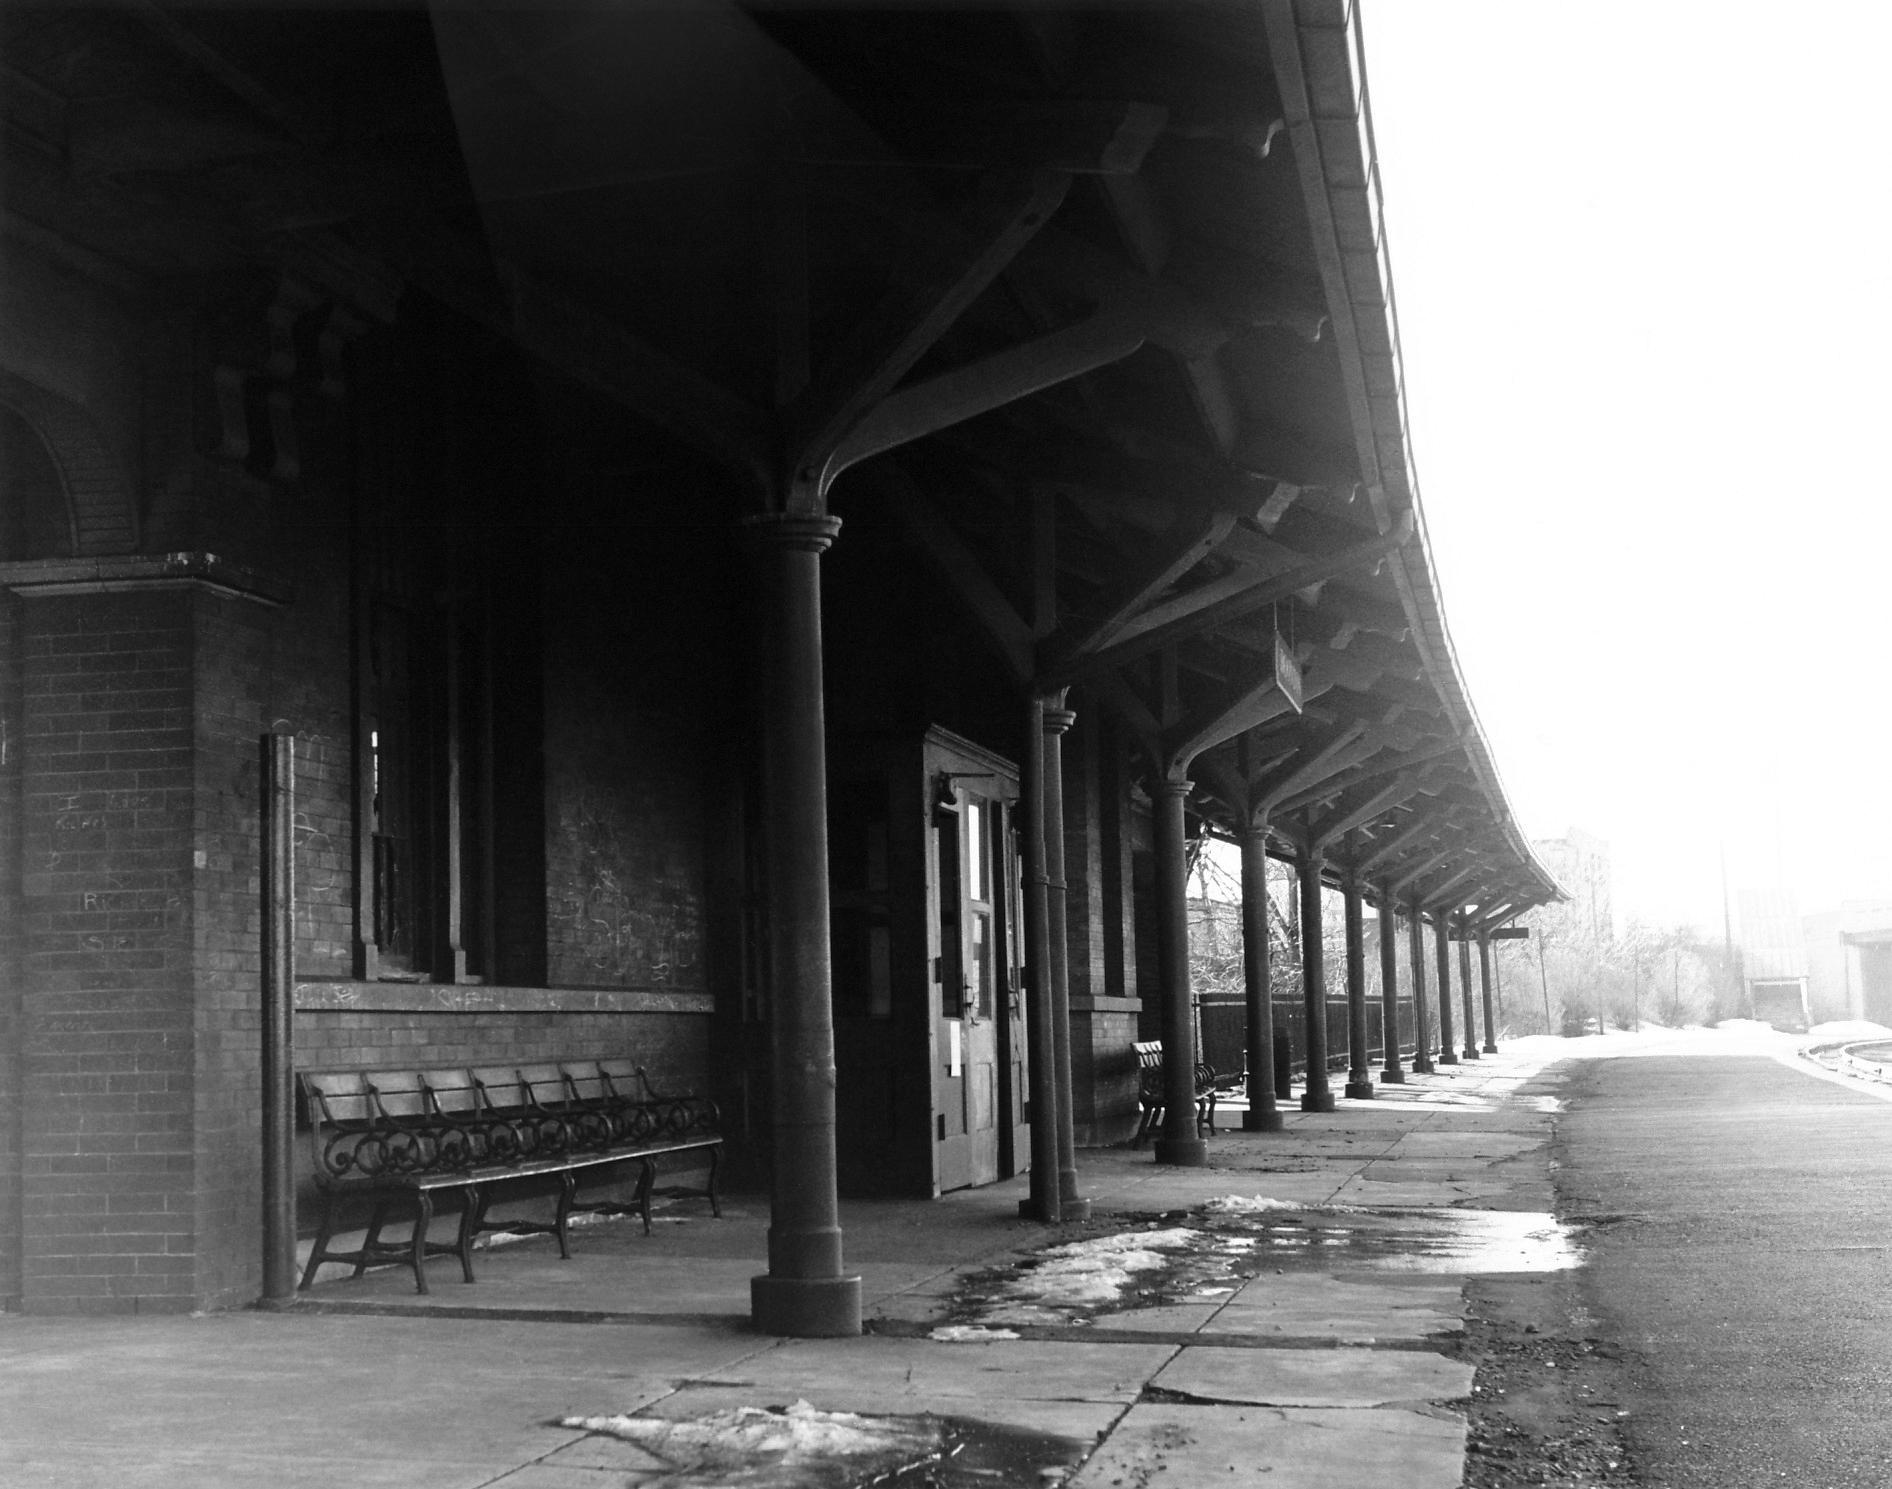 30 Station platform (Boonton, NJ - 1-22-64 - RRAveEnt coll).jpg